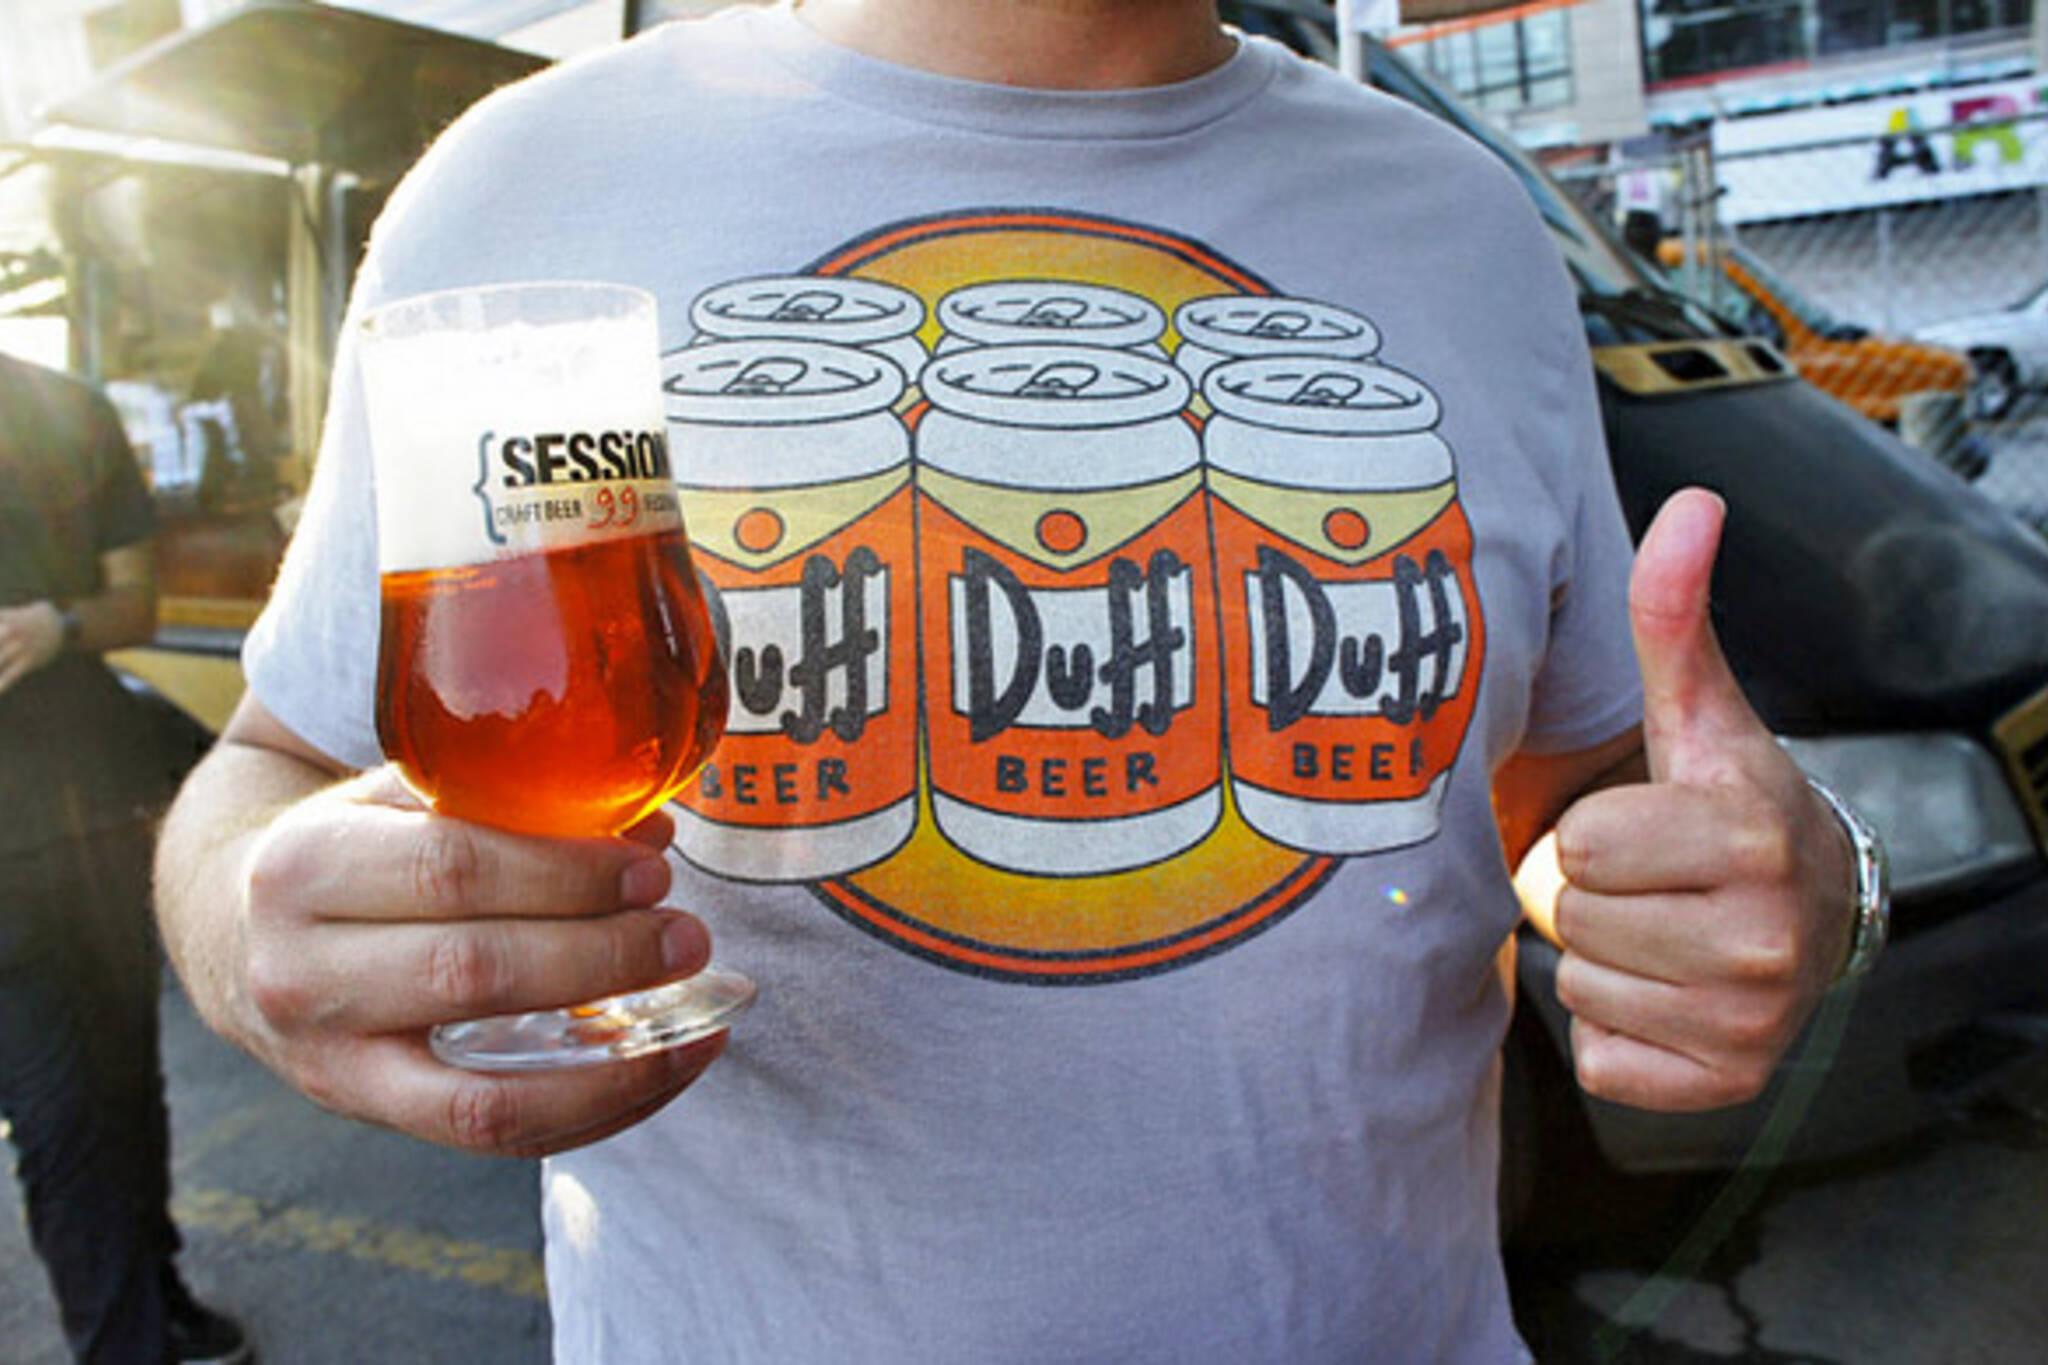 Session 99 Craft Beer Festival